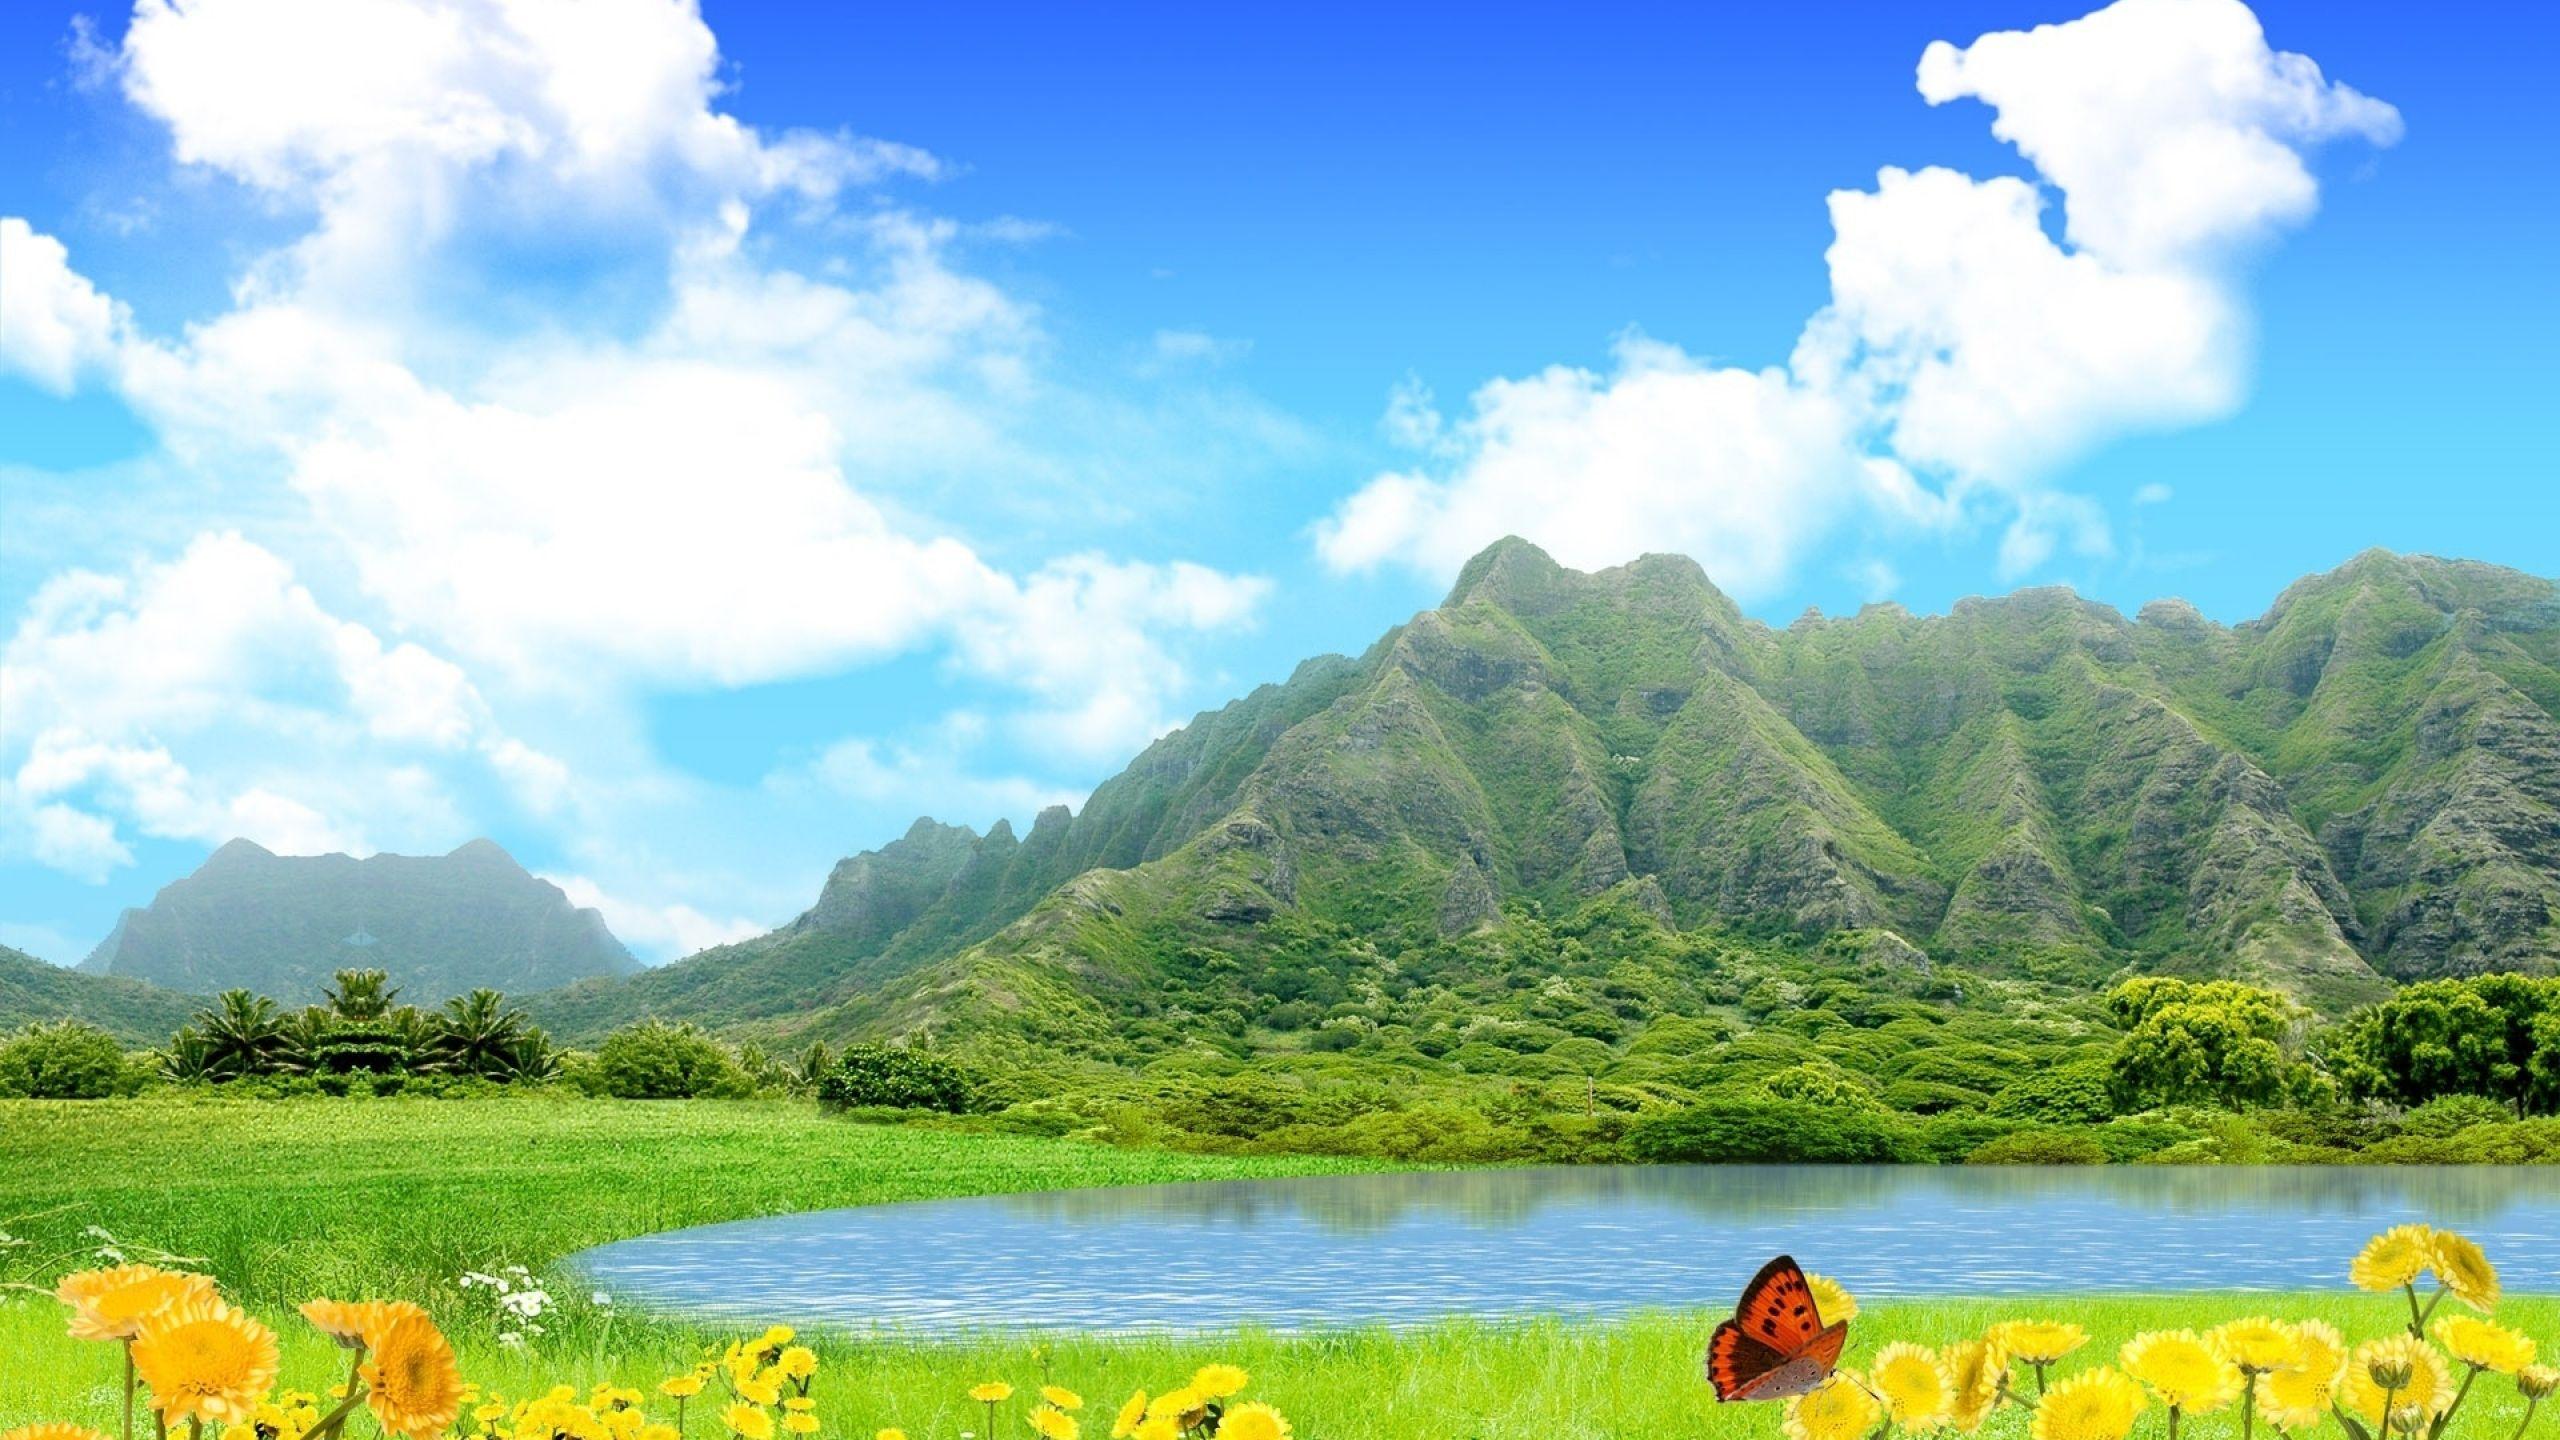 Download Wallpaper 2560x1440 Mountains Lake Sky Flowers Butterfly Summer Mac Imac 27 Hd Background Scenery Wallpaper Fantasy Landscape Nature Wallpaper